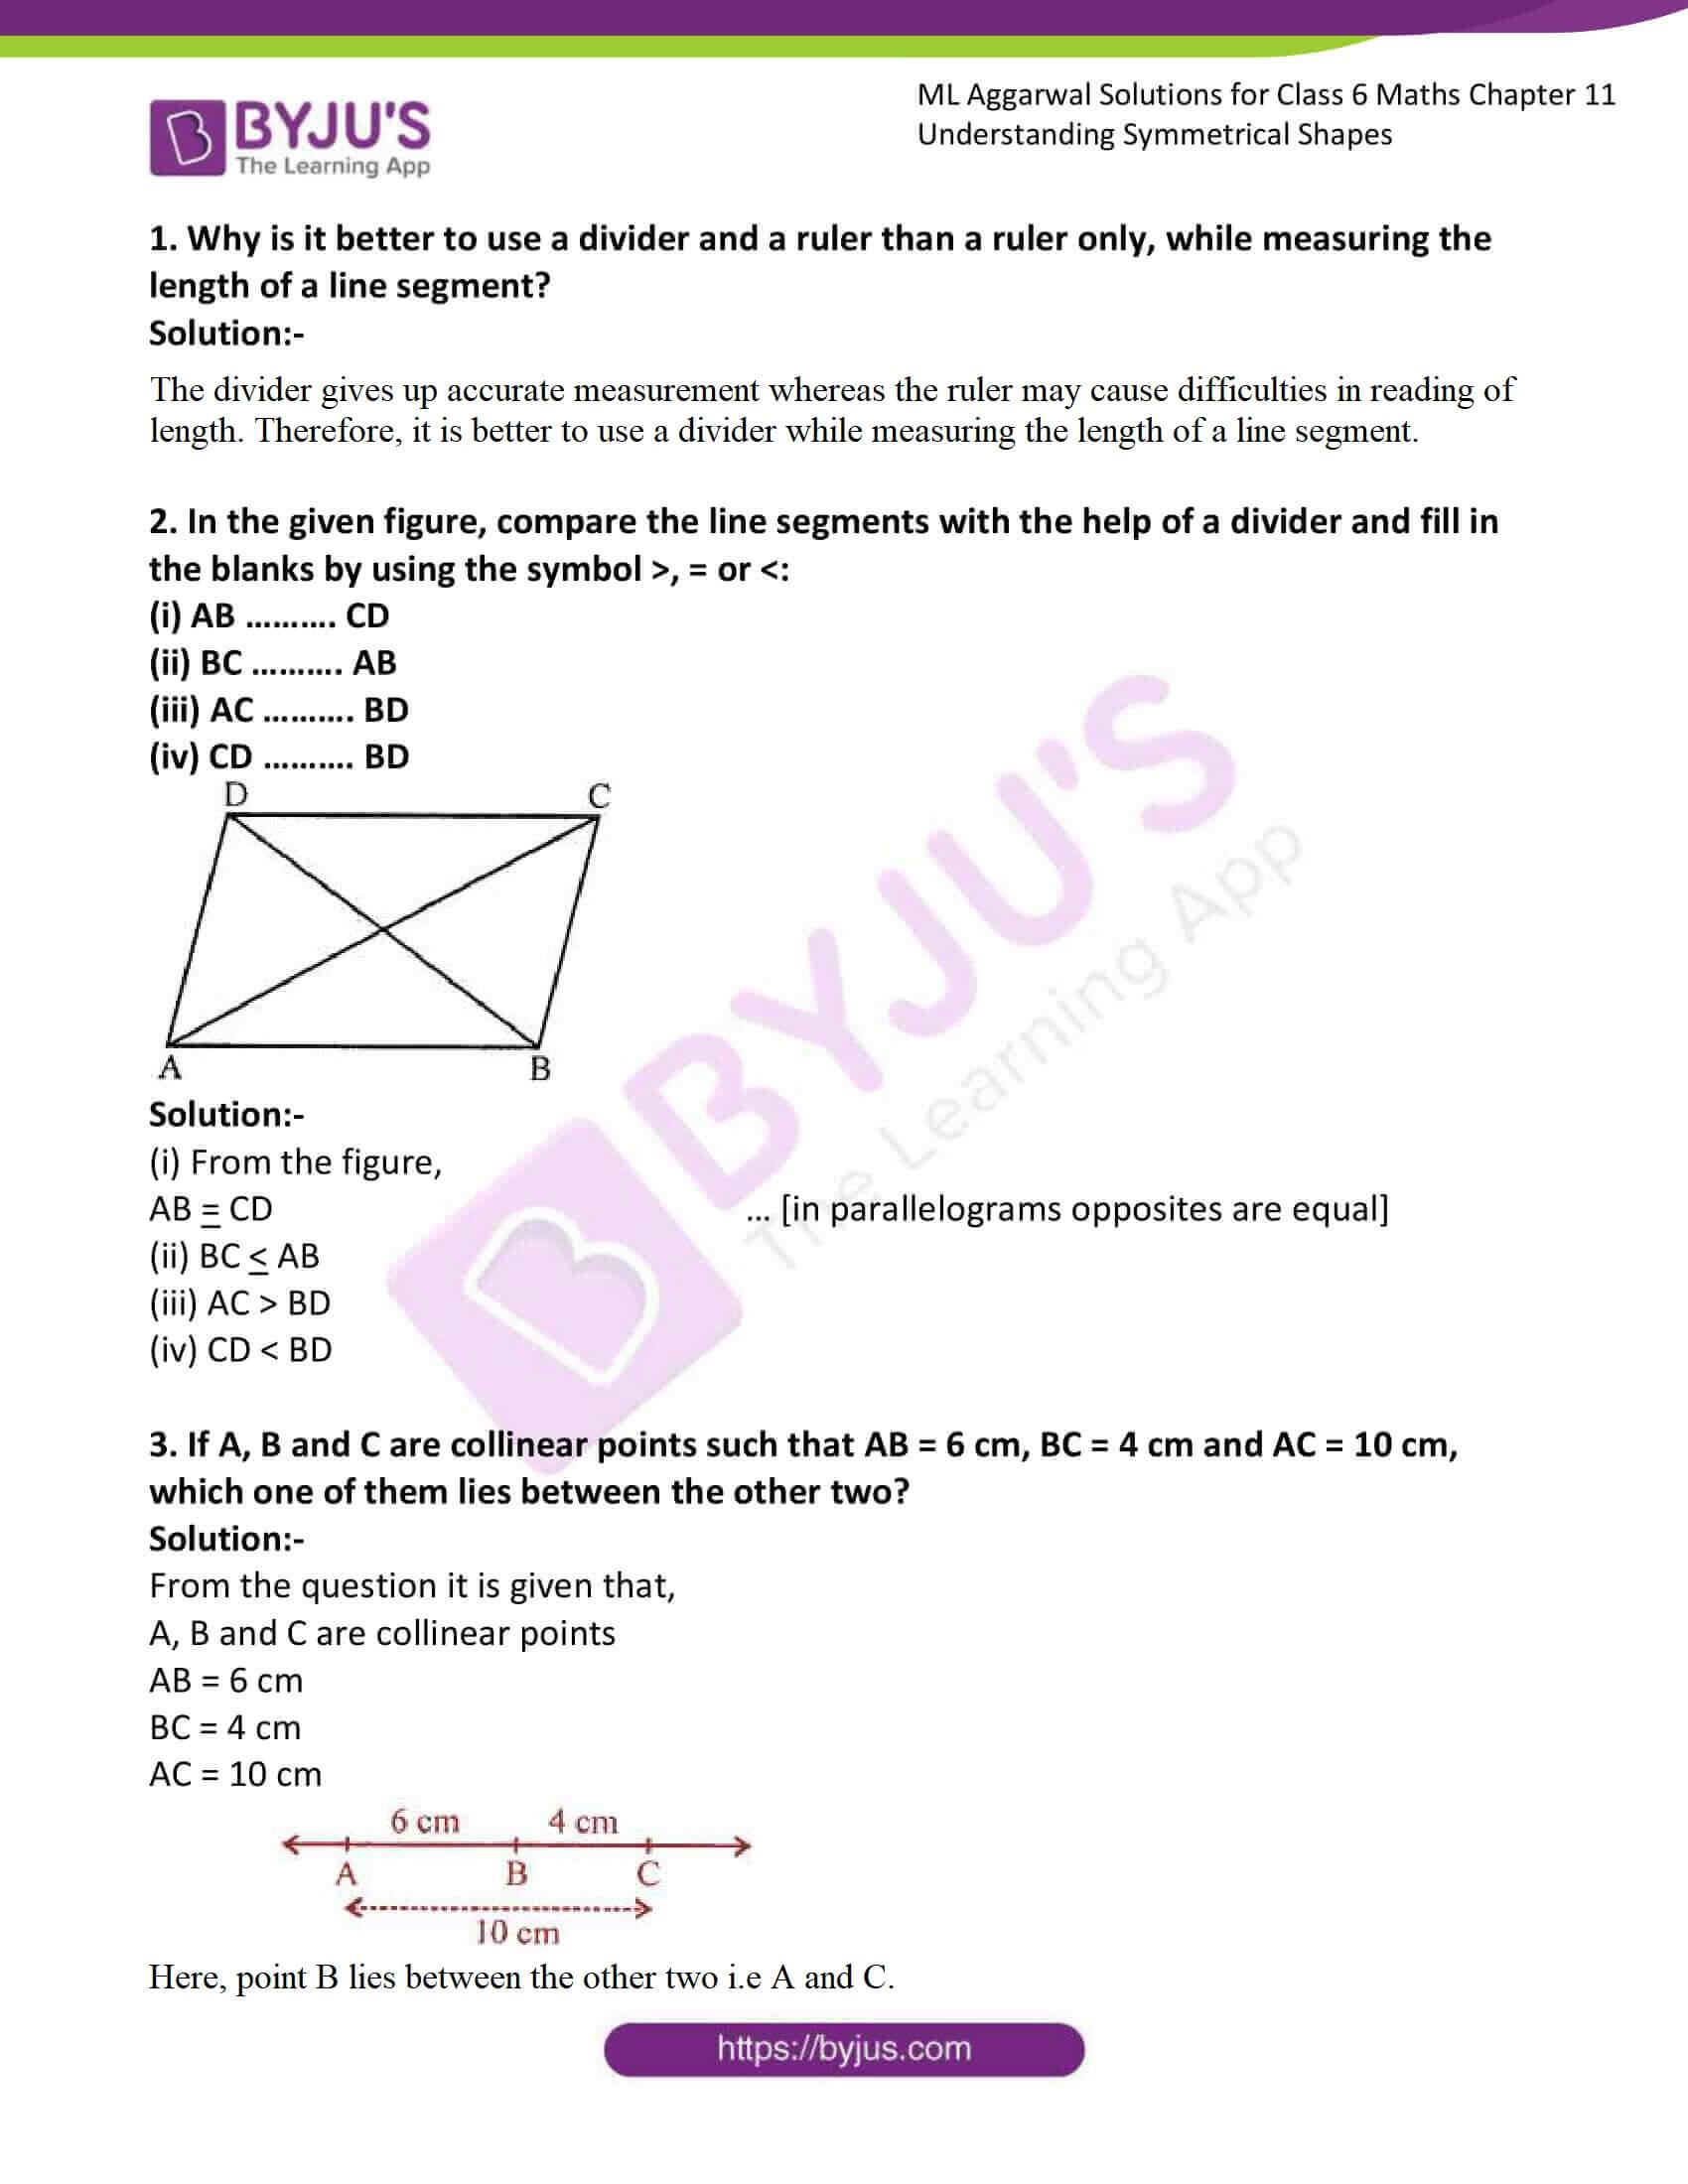 ml aggarwal sol class 6 maths chapter 11 1